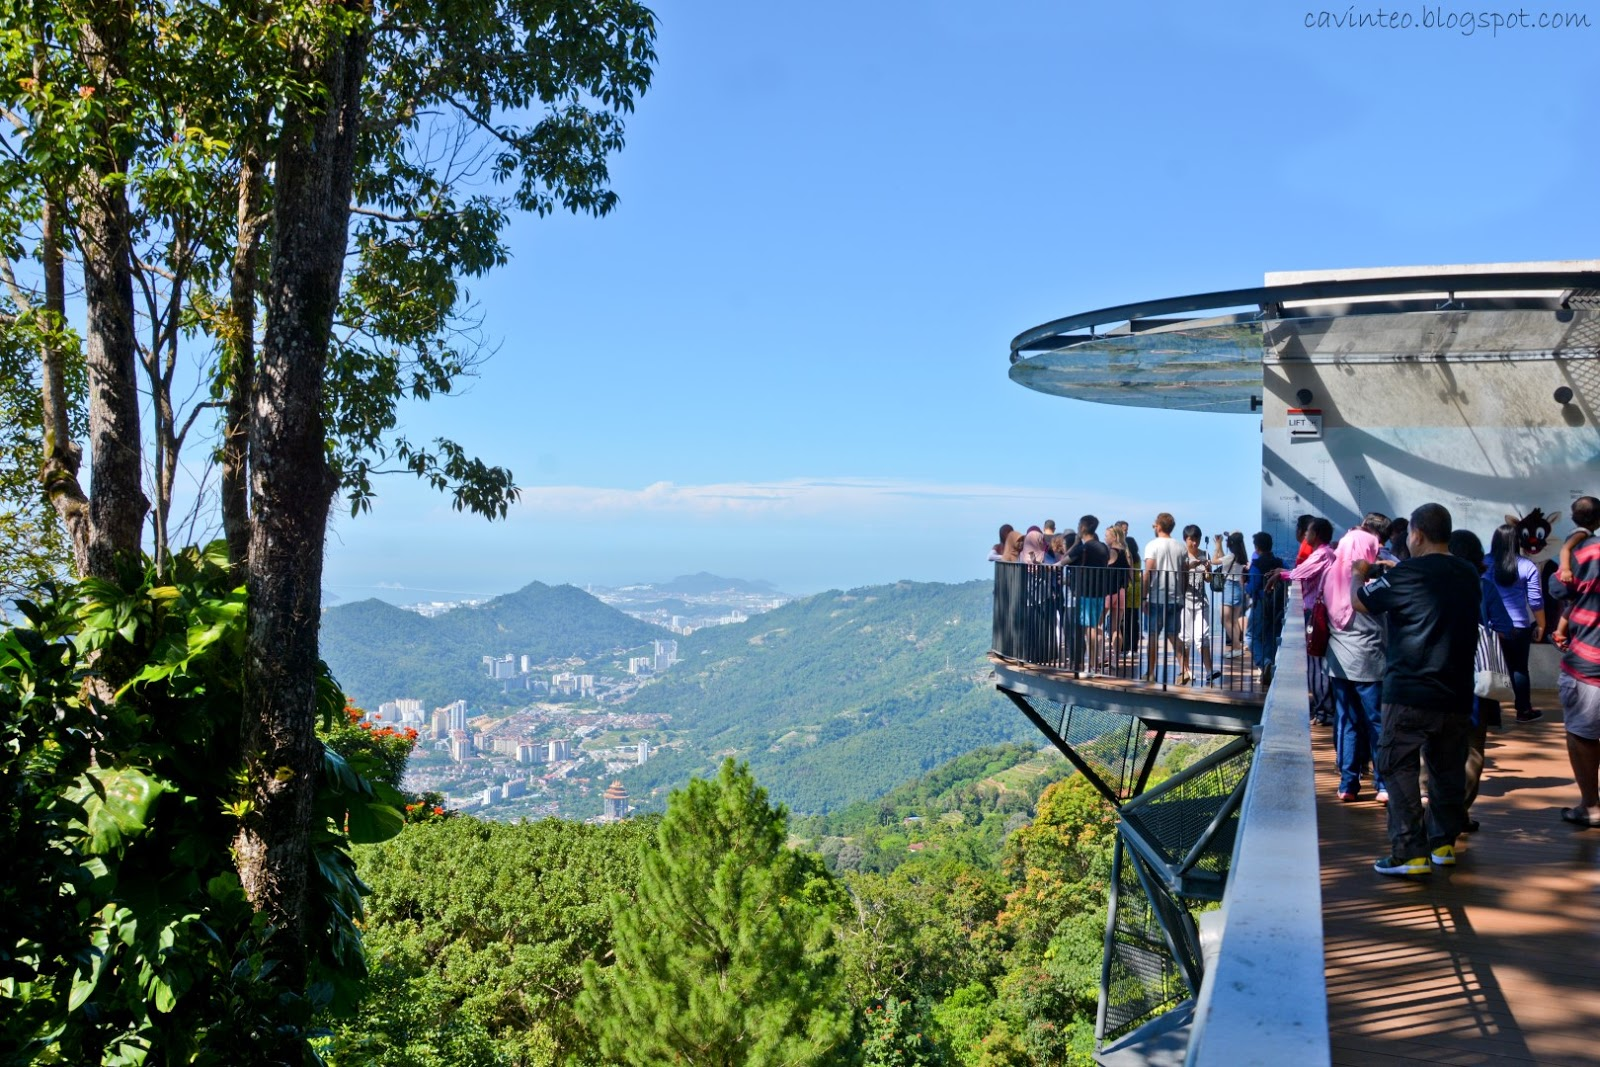 07 SGE_5746 Top of Penang Hill (Bukit Bendera) - Fantastic Scenery of the City & Peninsular Malaysia via its Viewing Decks.JPG